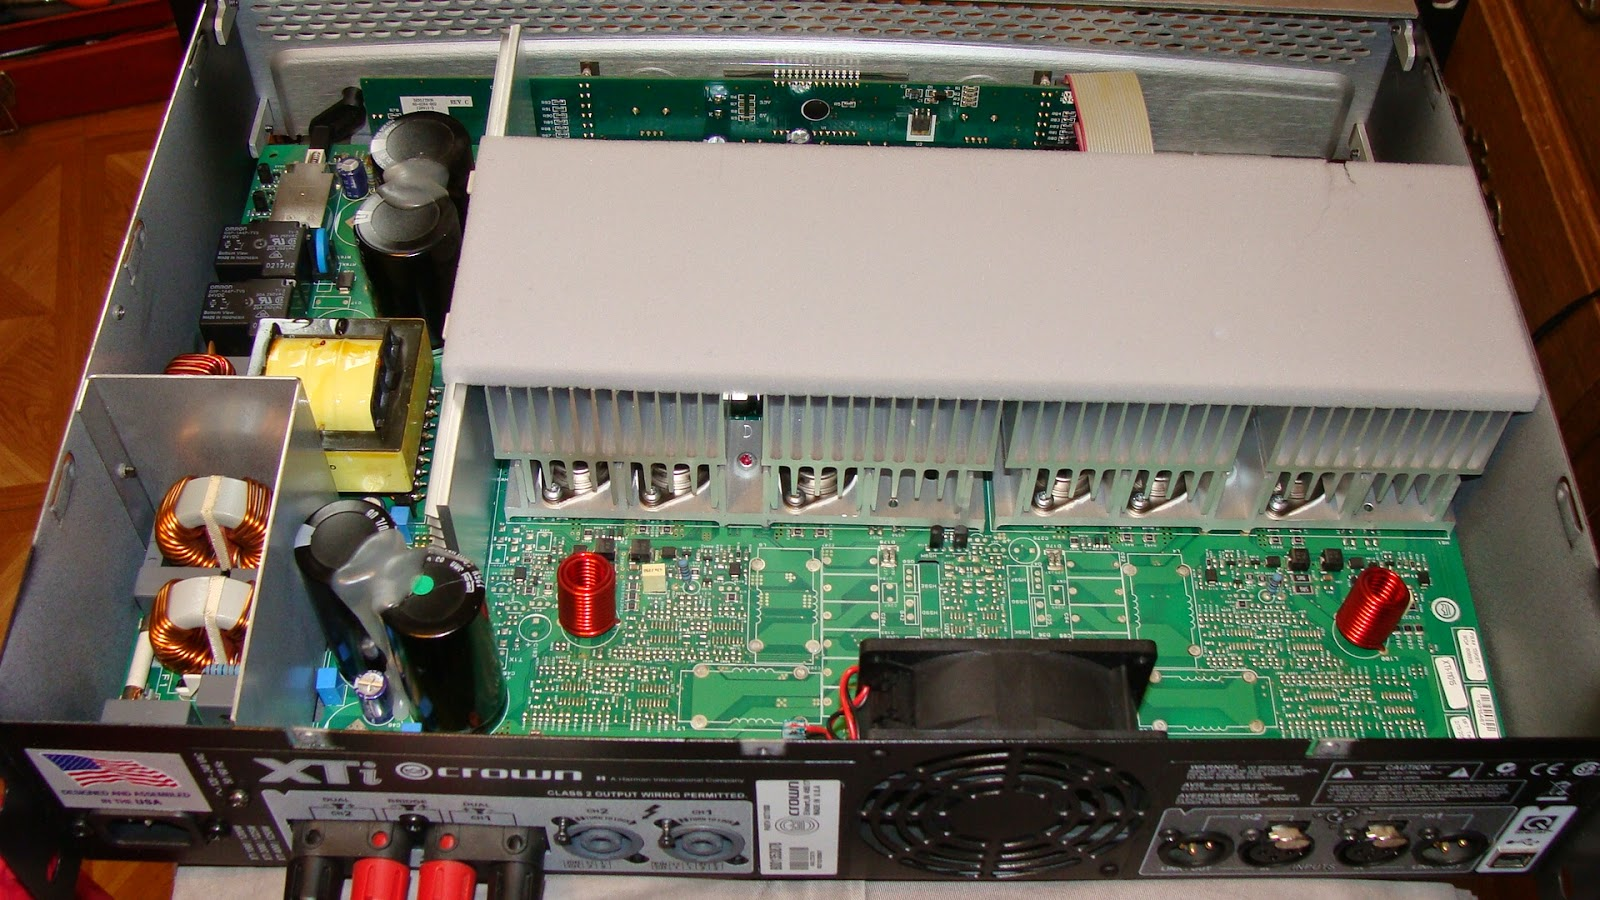 Crown Xti 1000 : my commentary and technical help crown xti 1000 power amplifier repair ~ Russianpoet.info Haus und Dekorationen